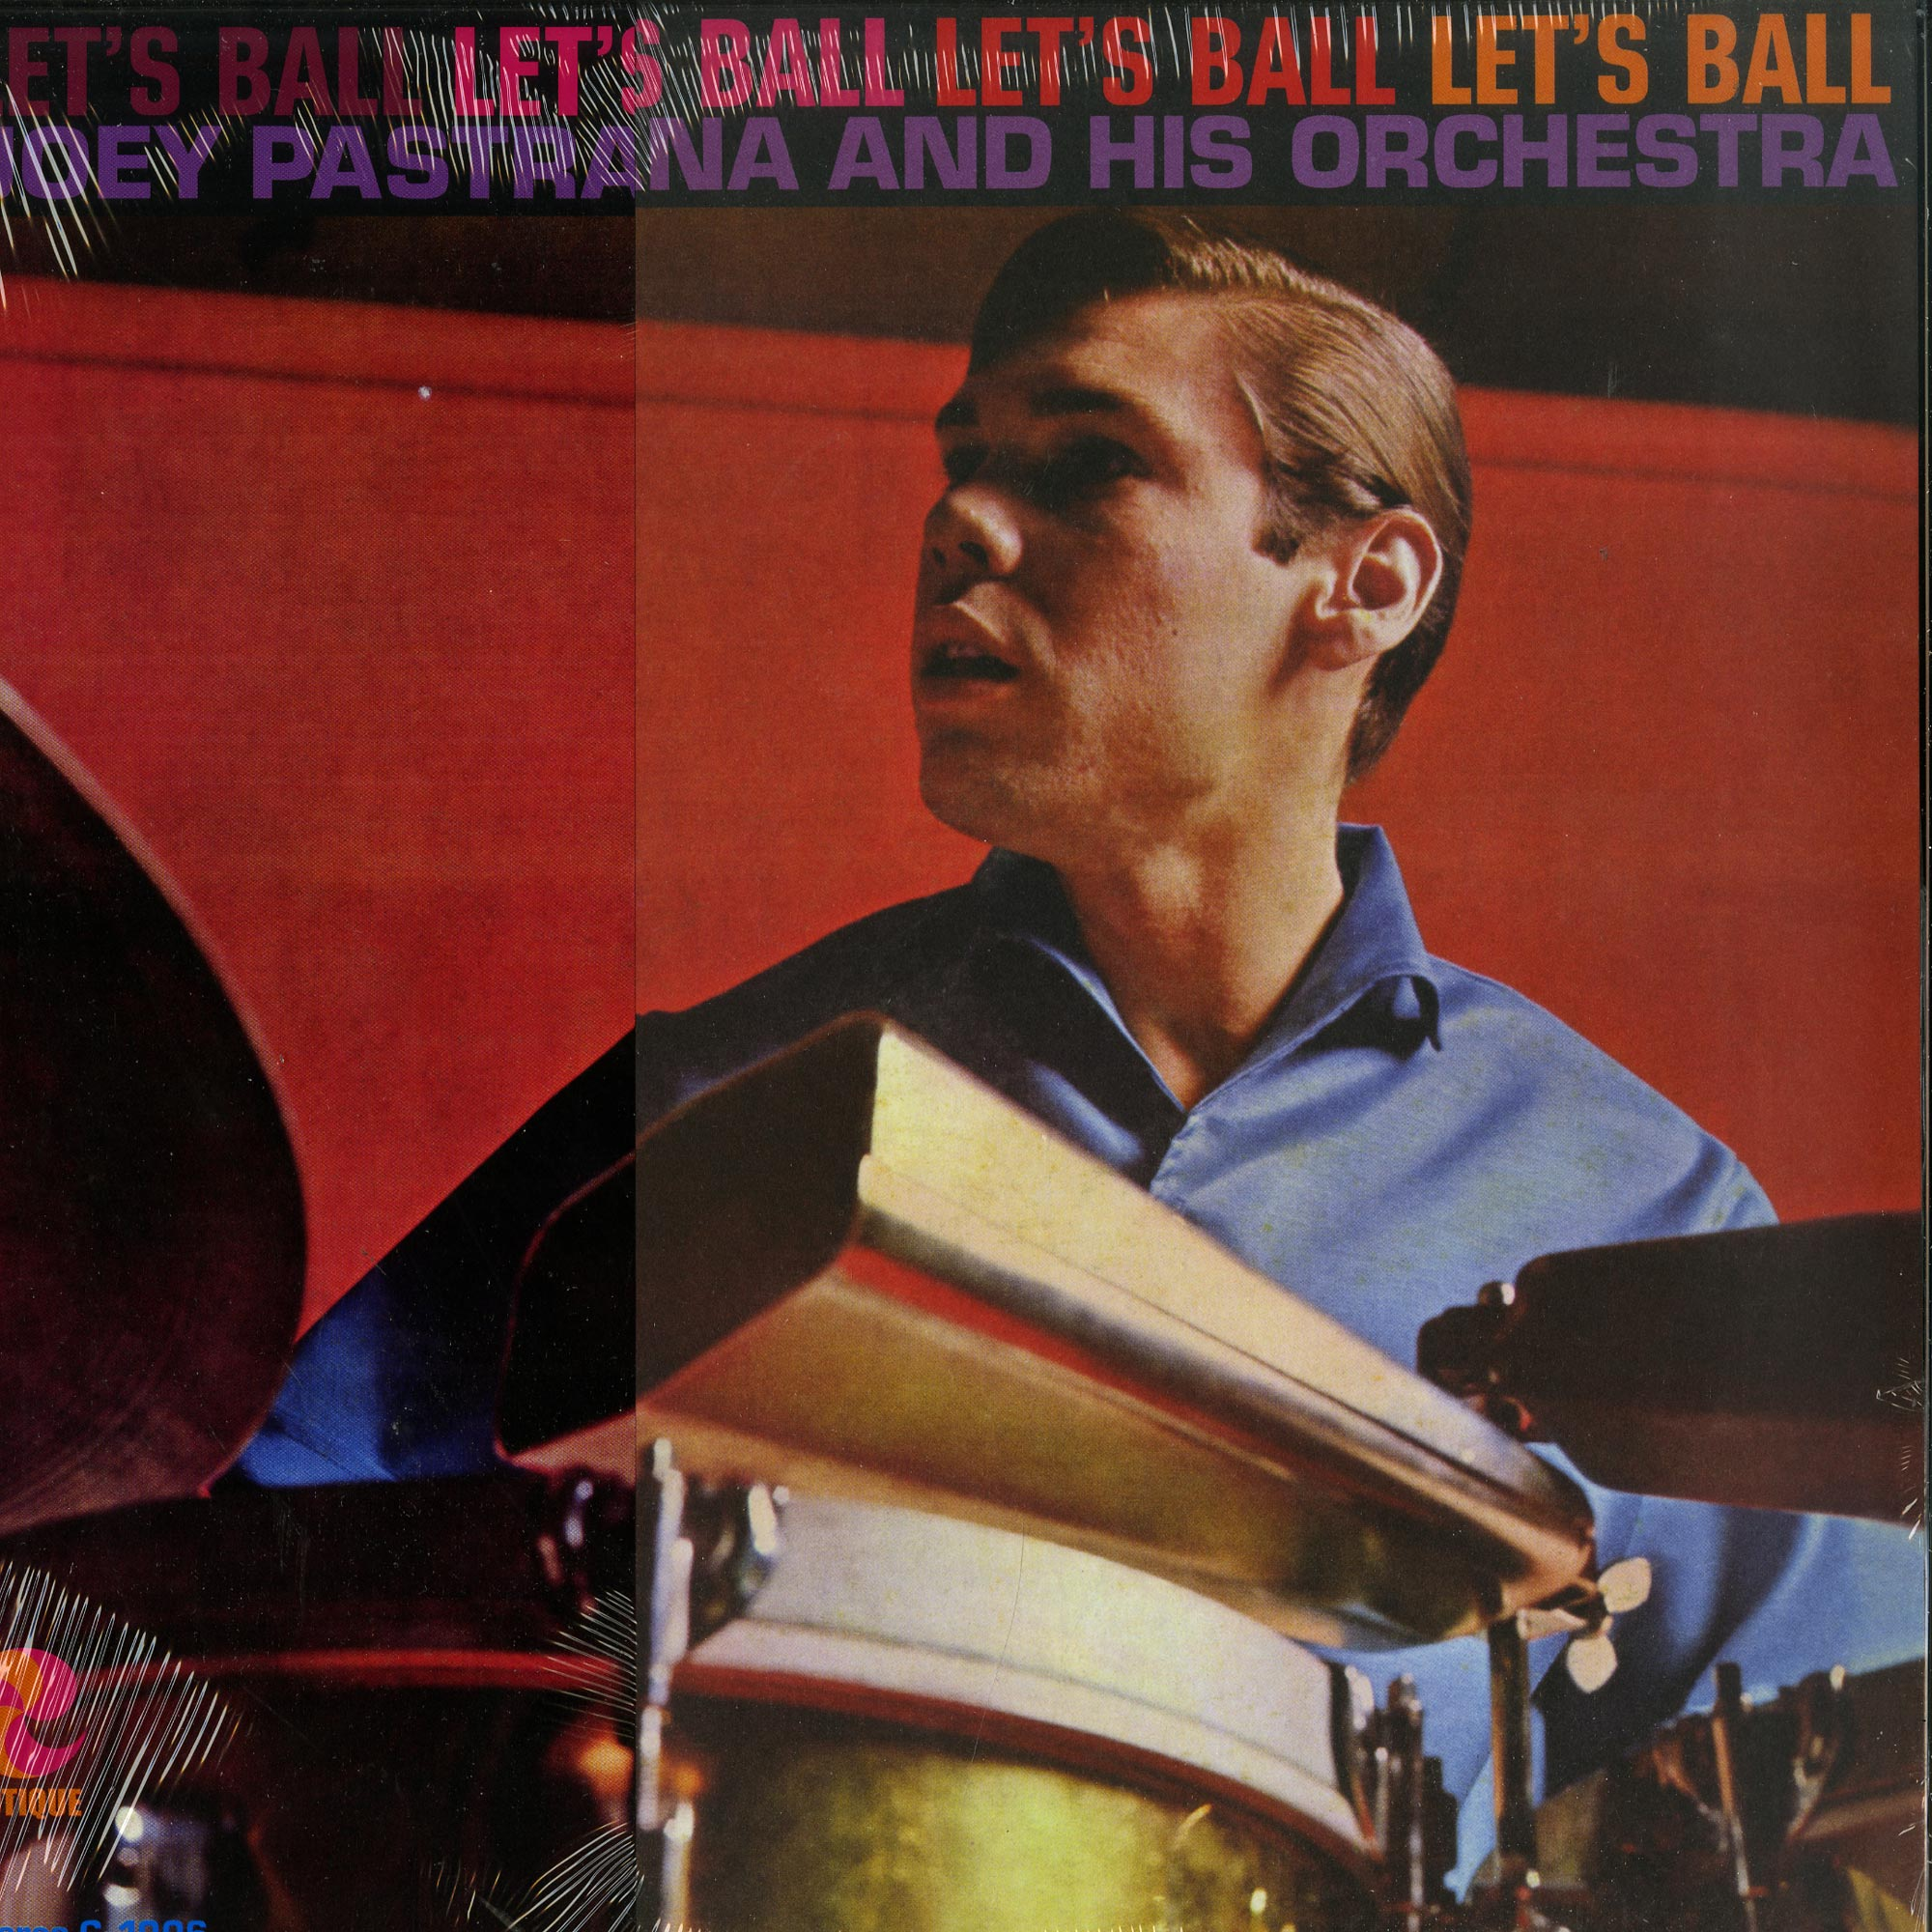 Joey Pastrana & His Orchestra - LETS BALL